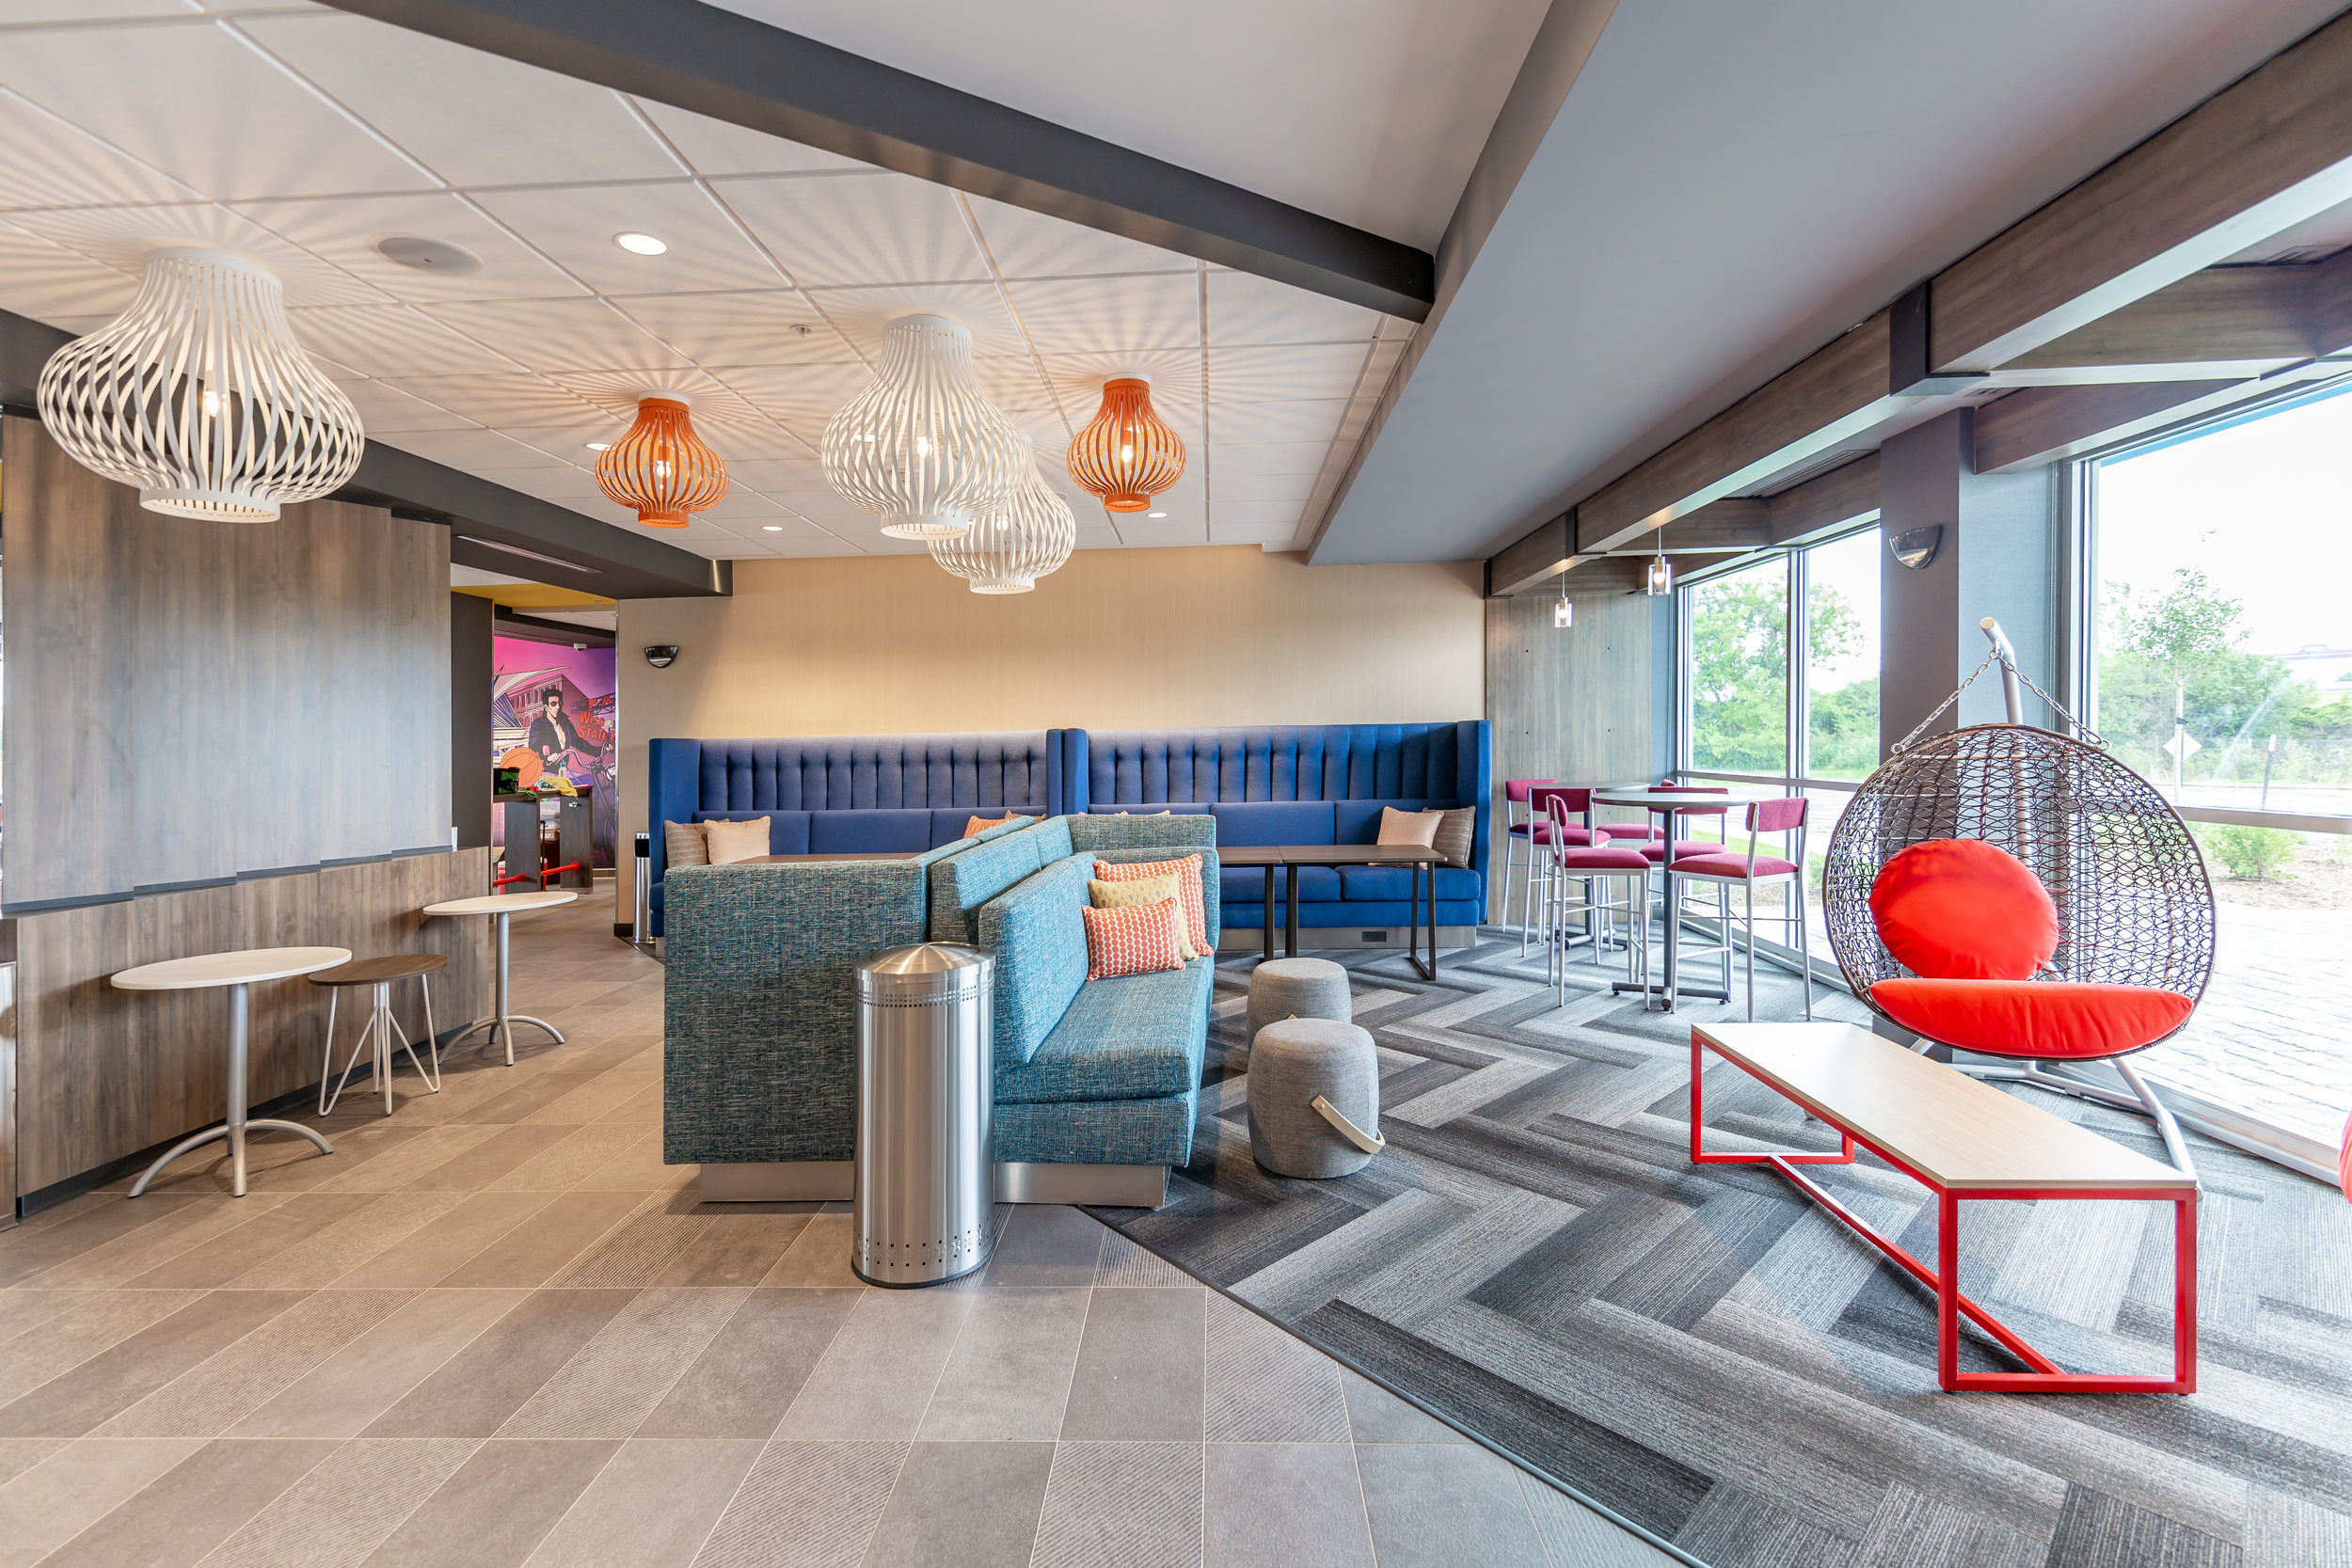 Lunge/hangout area in Tru by Hilton in Brookfield, WI